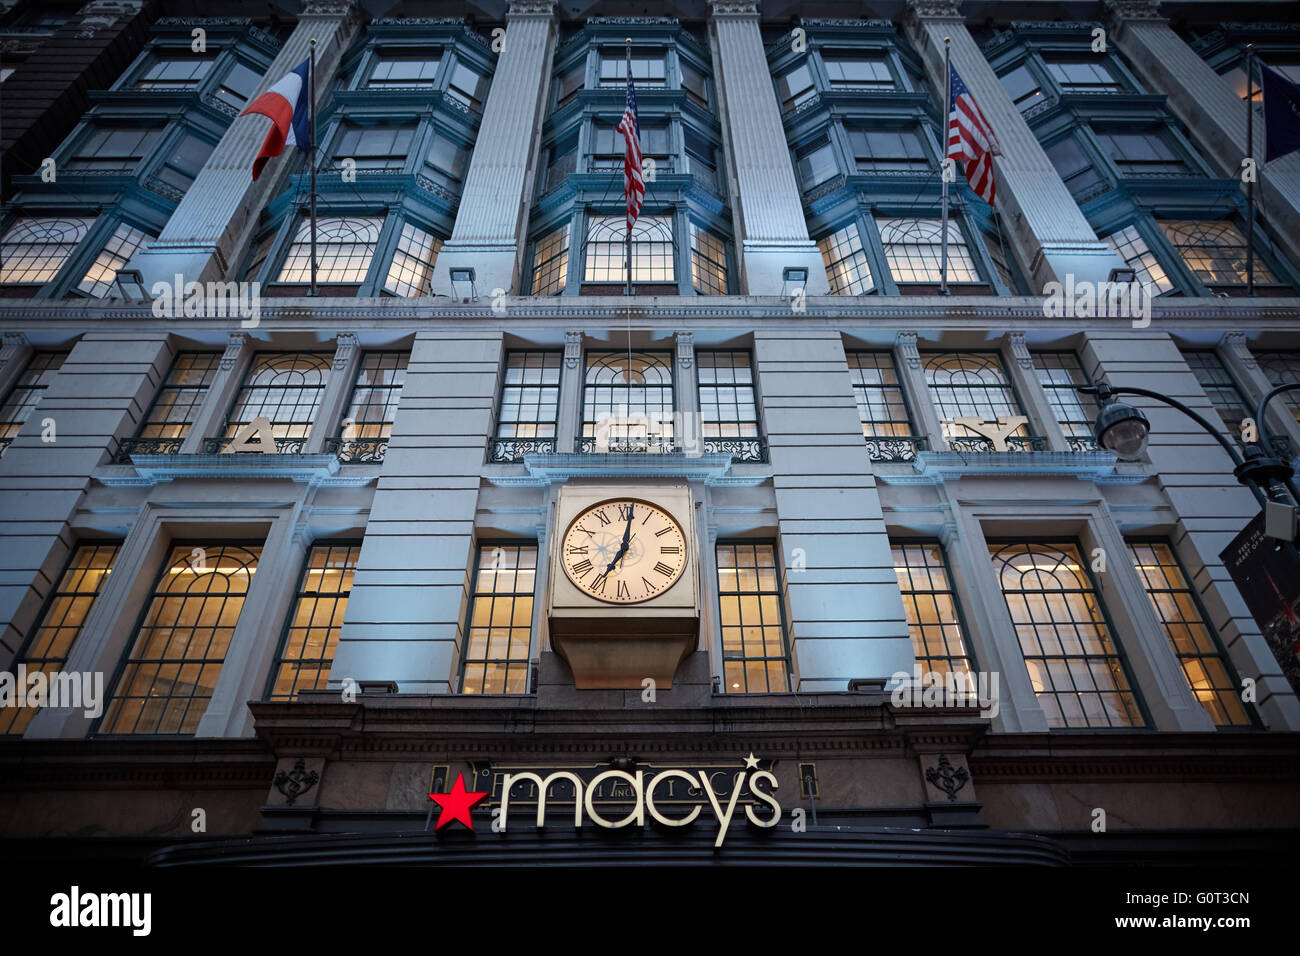 New York Macy 39 S Exterior Clock On Building Front Macy 39 S Herald Stock Photo 103791765 Alamy